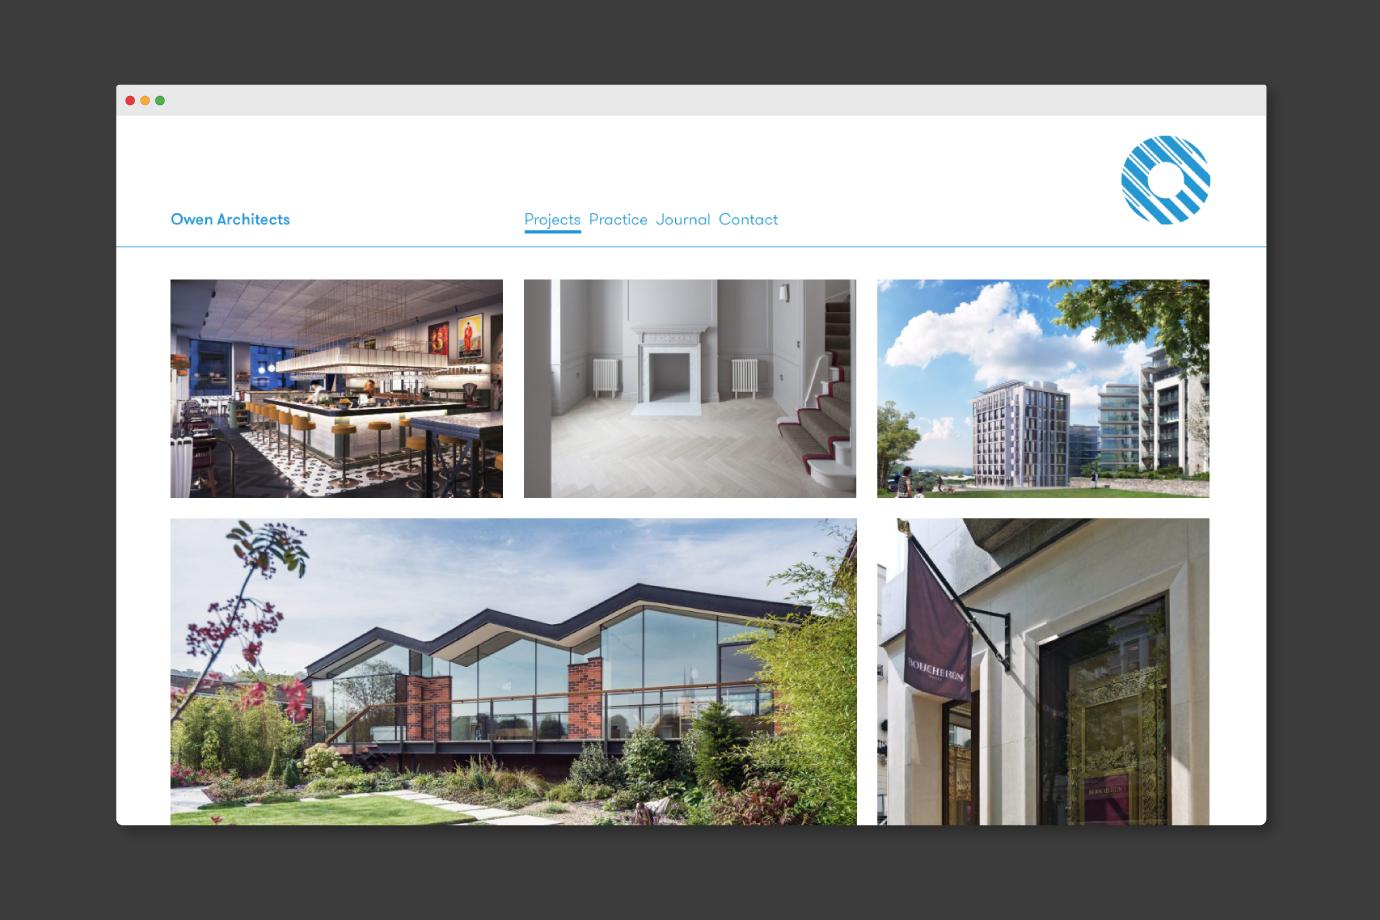 http://spystudio.co.uk/wp-content/uploads/2017/03/Owen_Architects_web-2.jpg